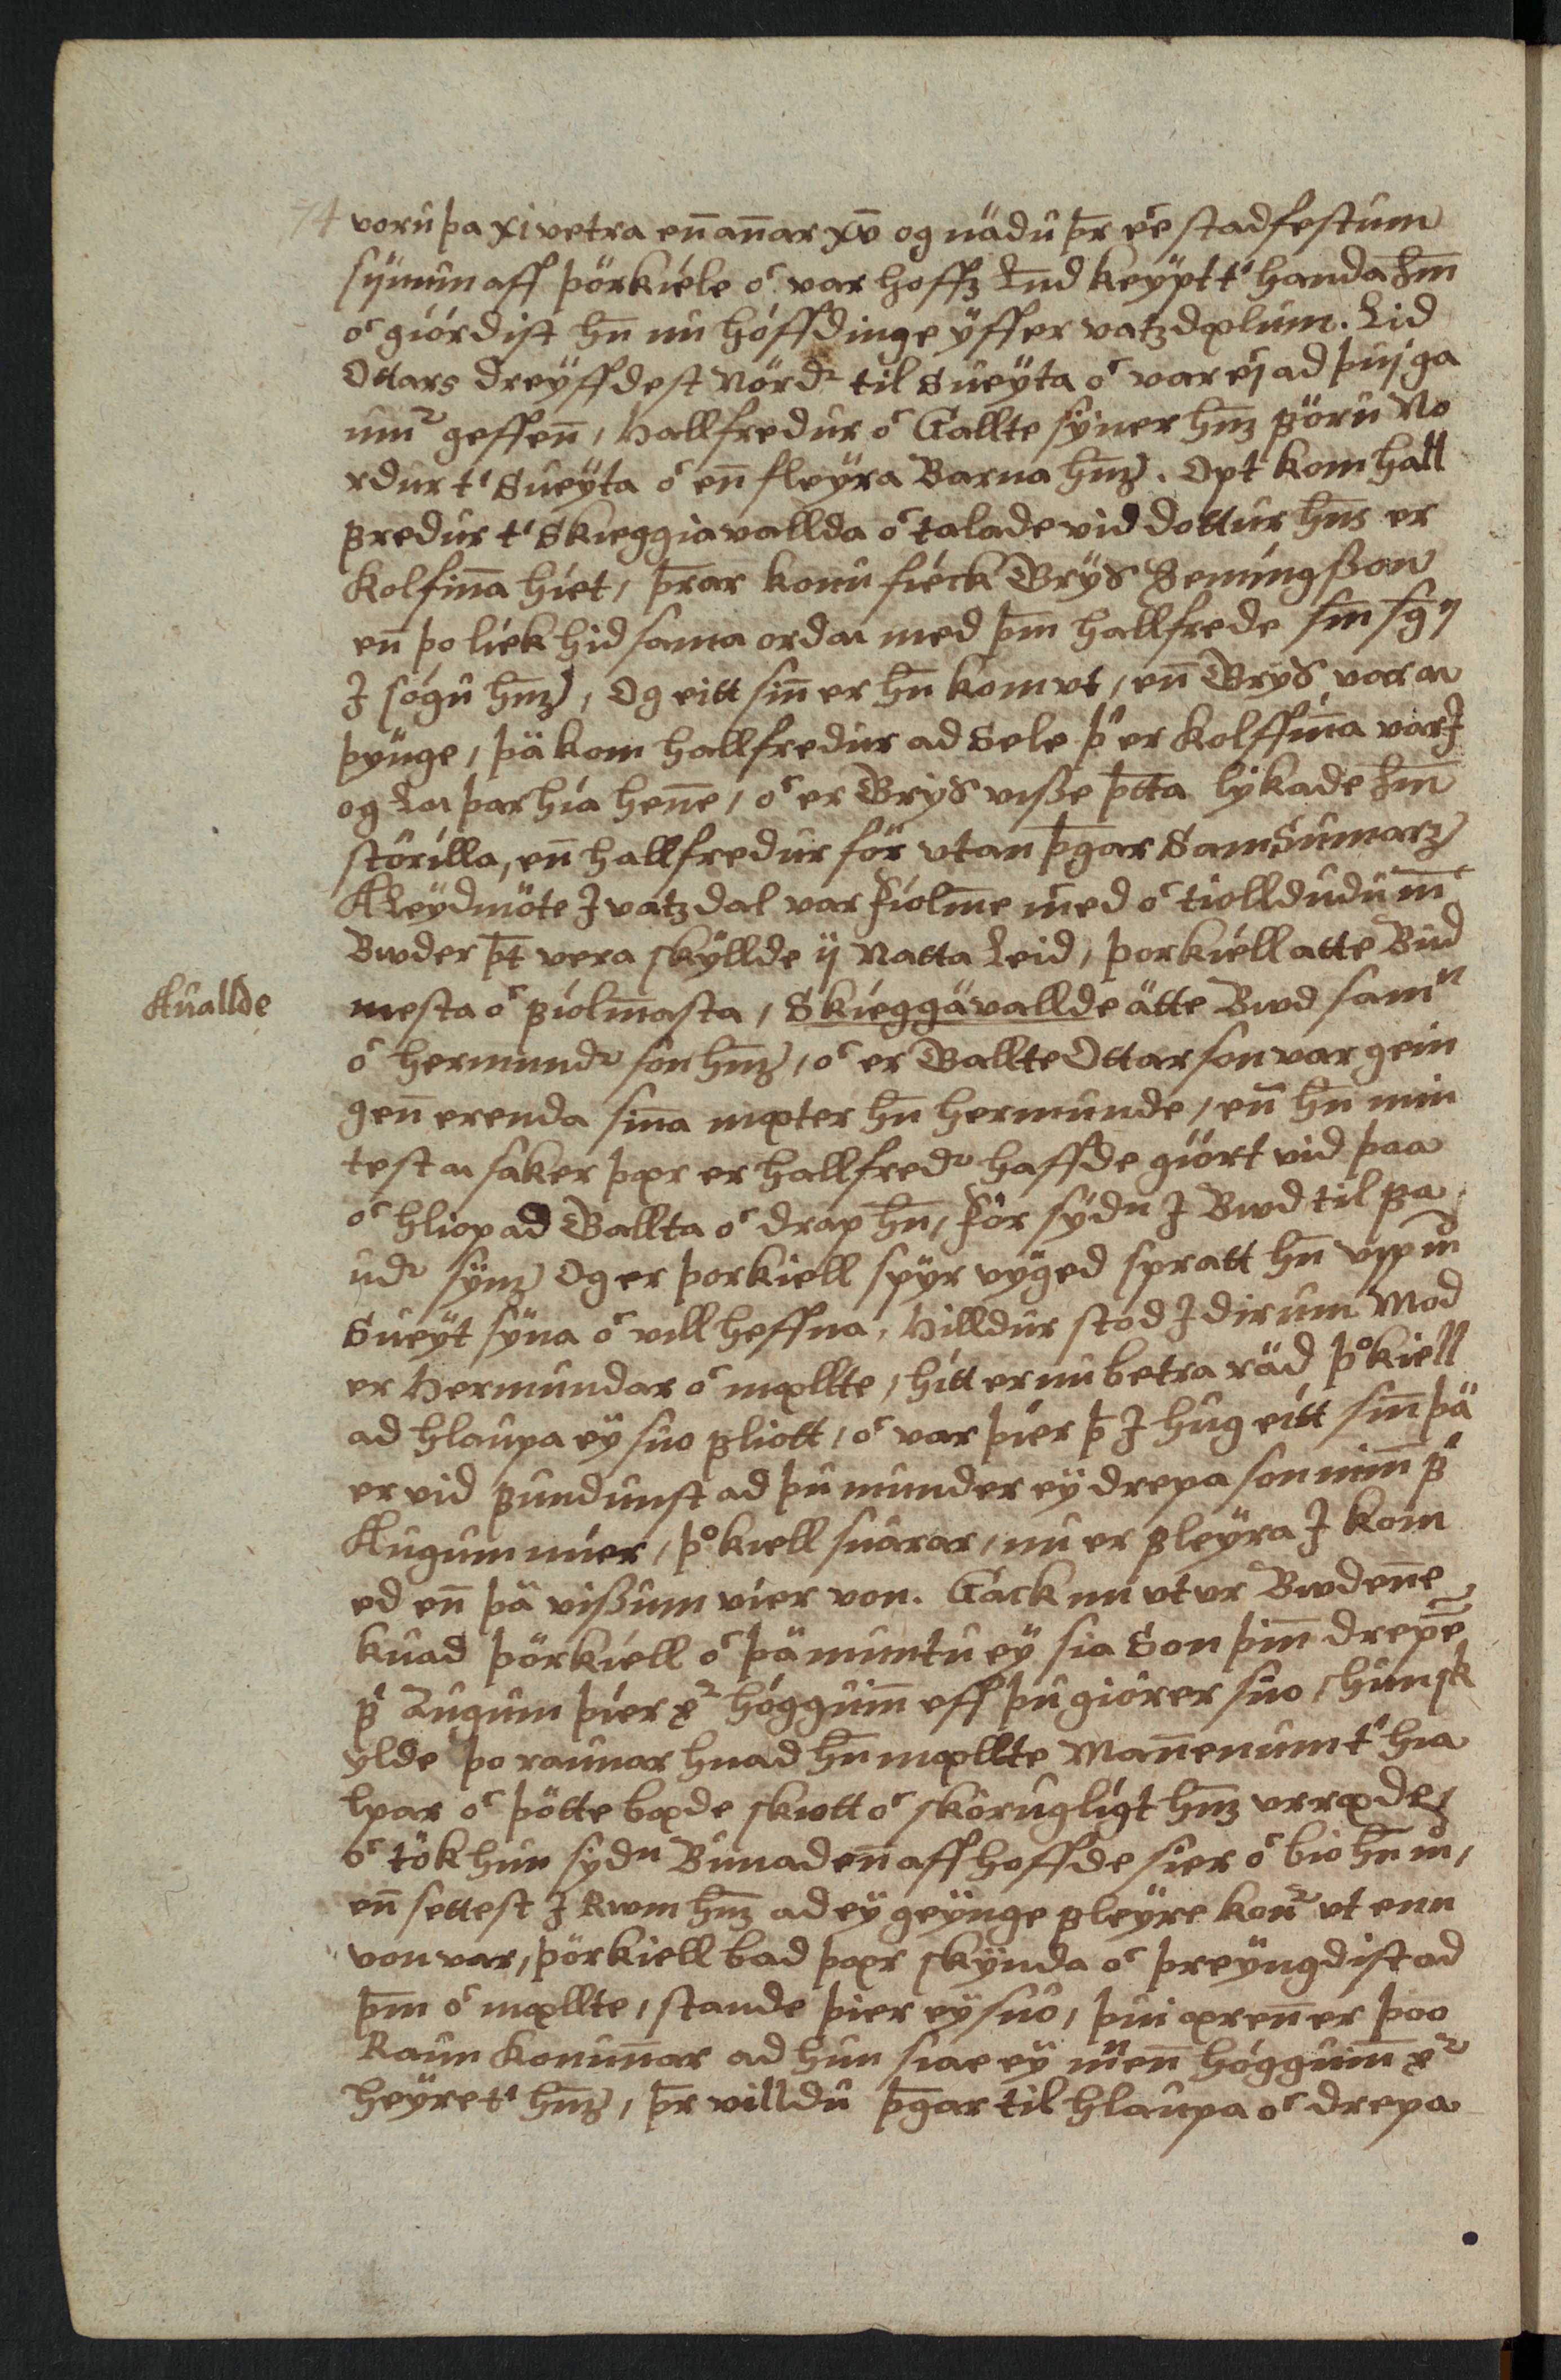 AM 138 fol - 37v